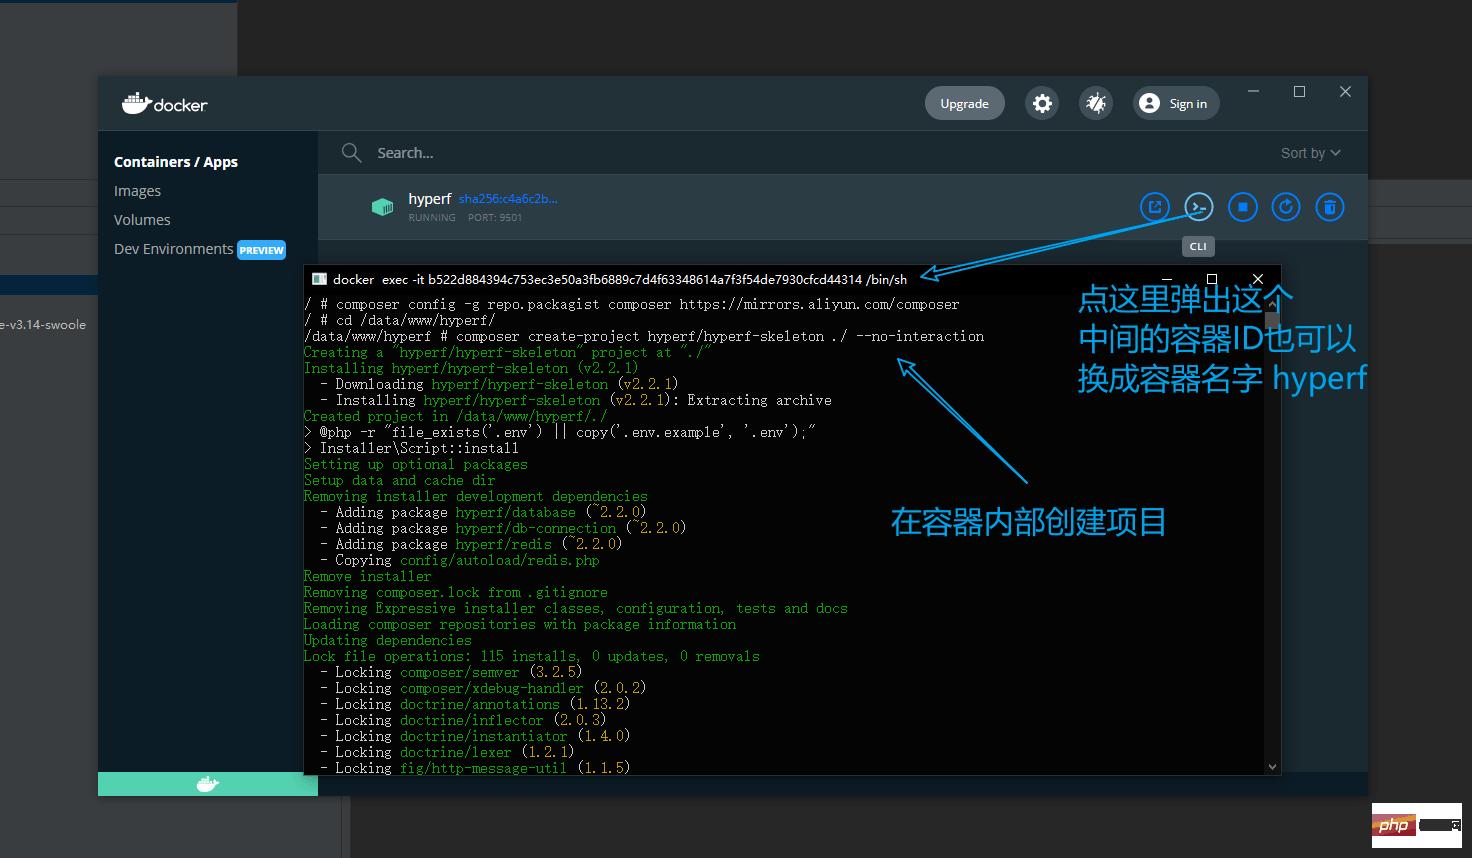 win10 配合 phpstorm 使用 docker 开发